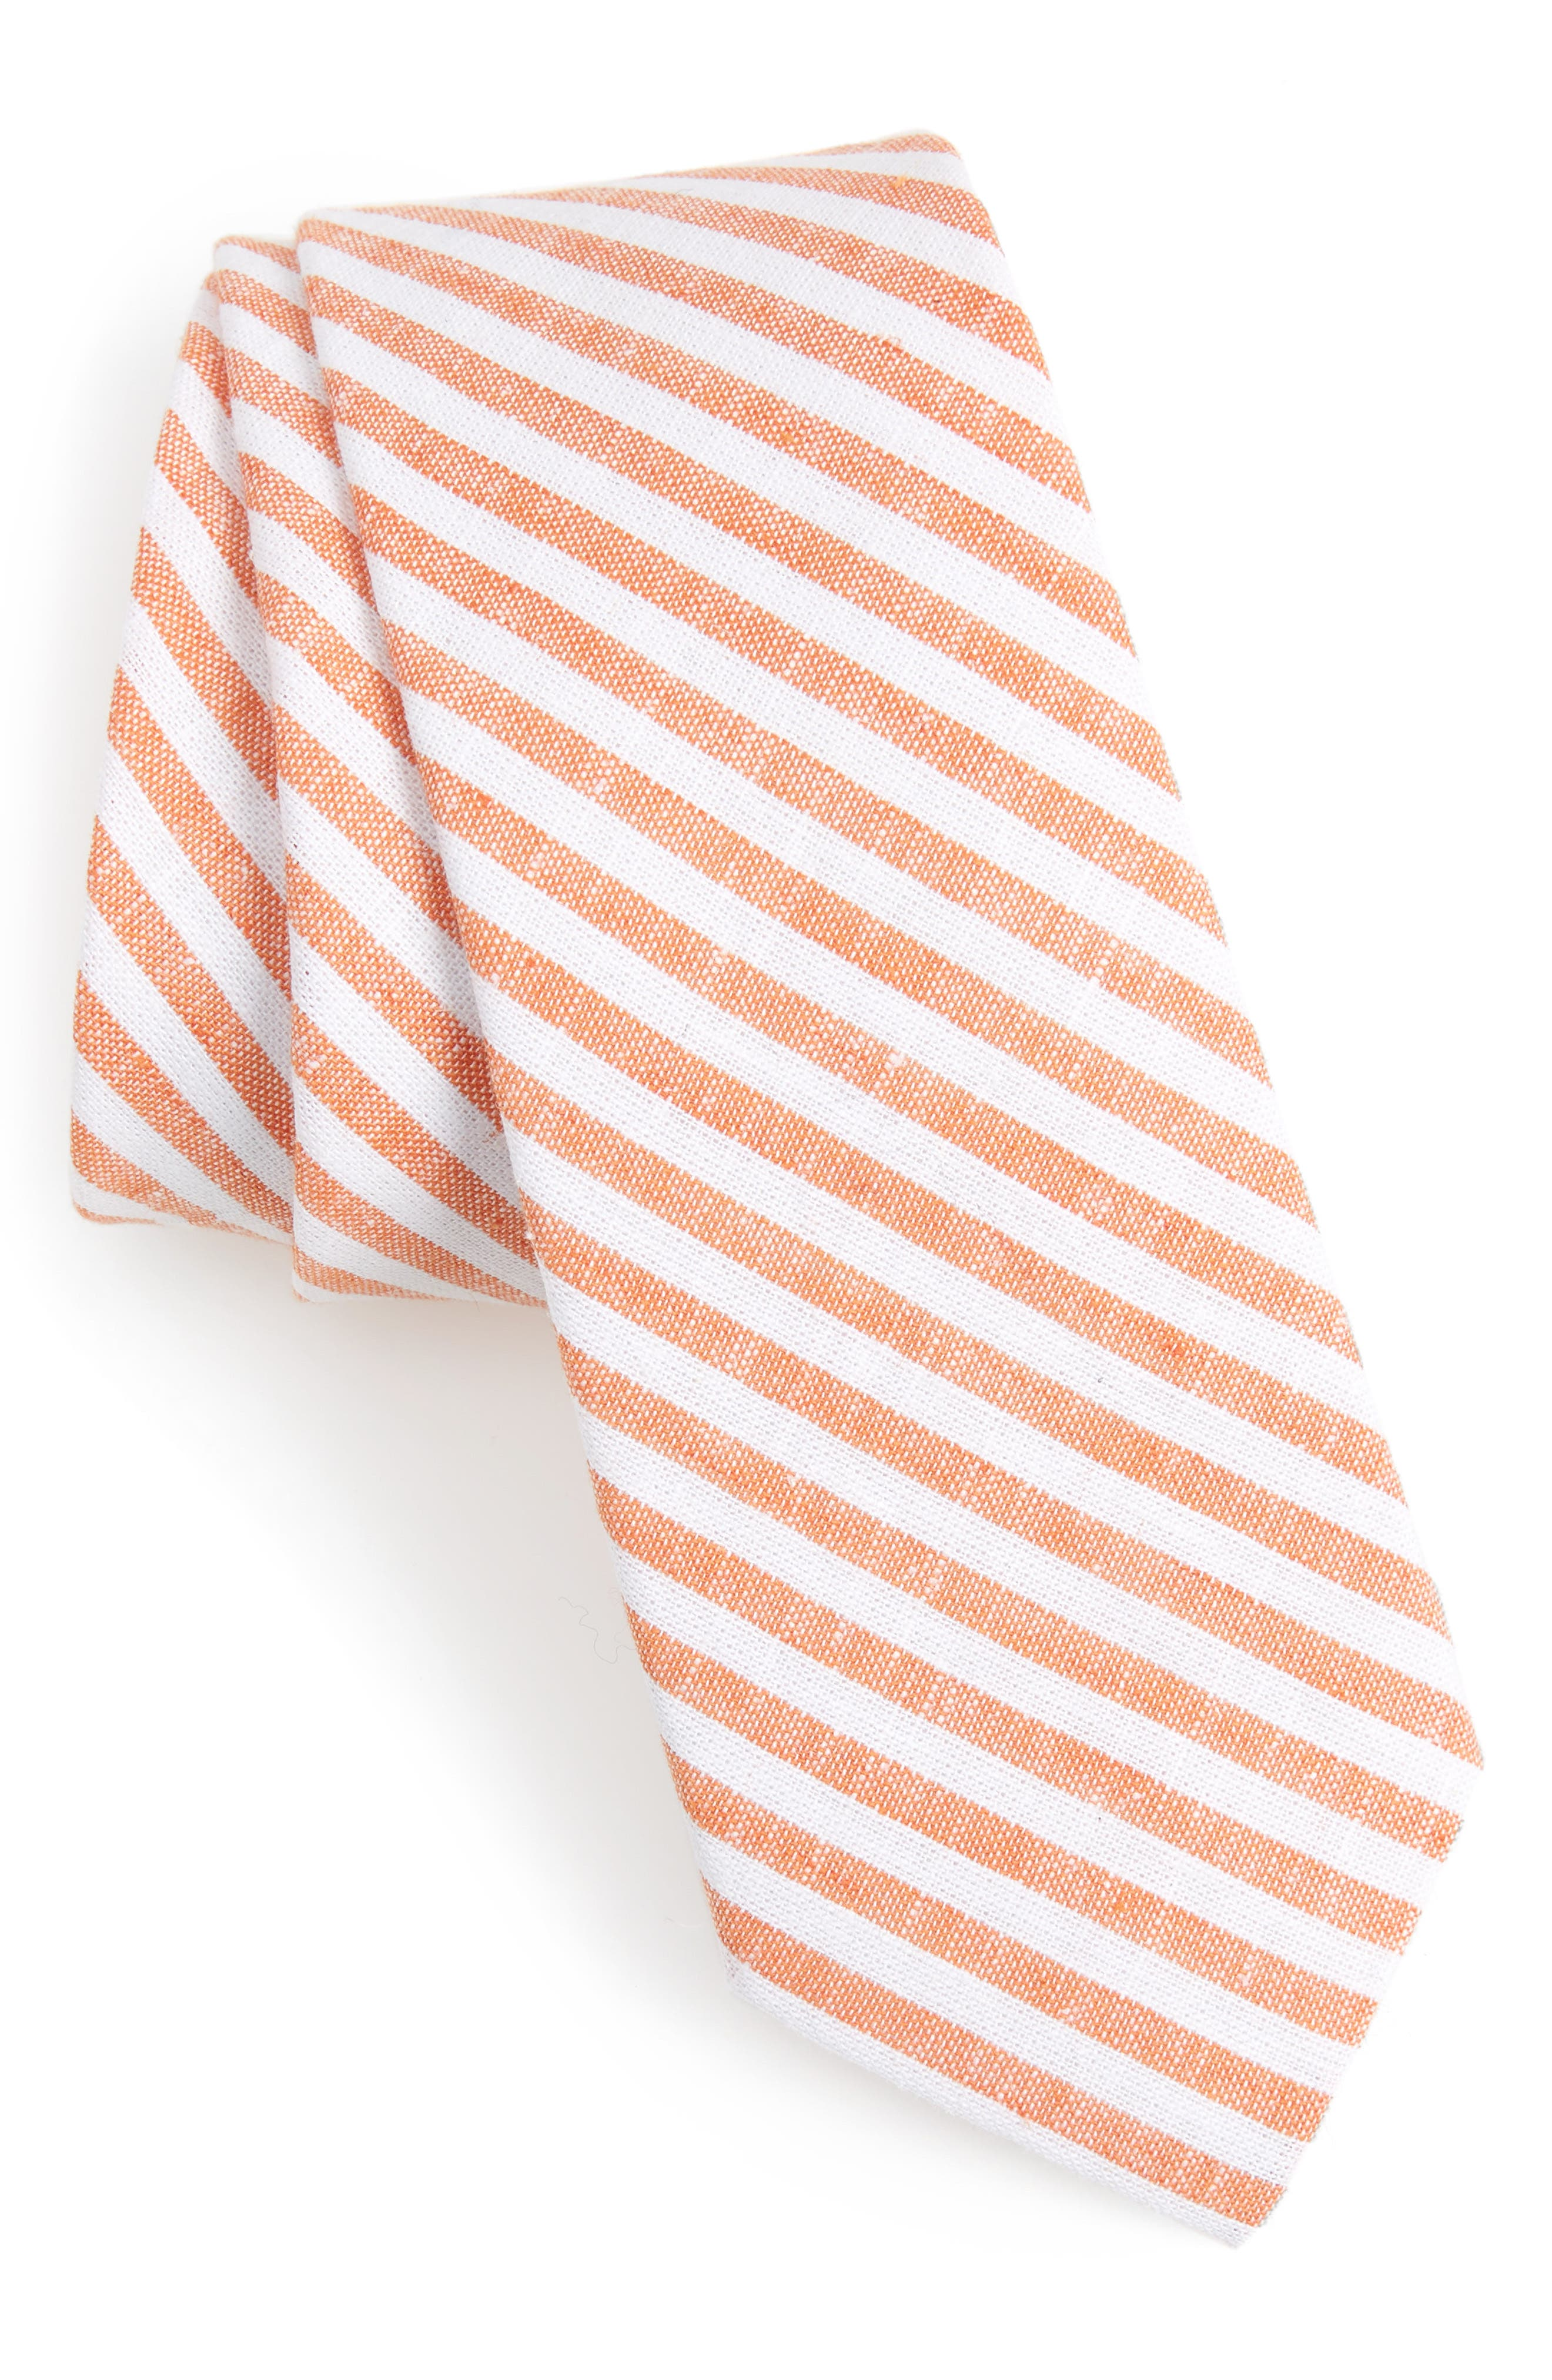 Telary Stripe Cotton Skinny Tie,                             Main thumbnail 1, color,                             Orange